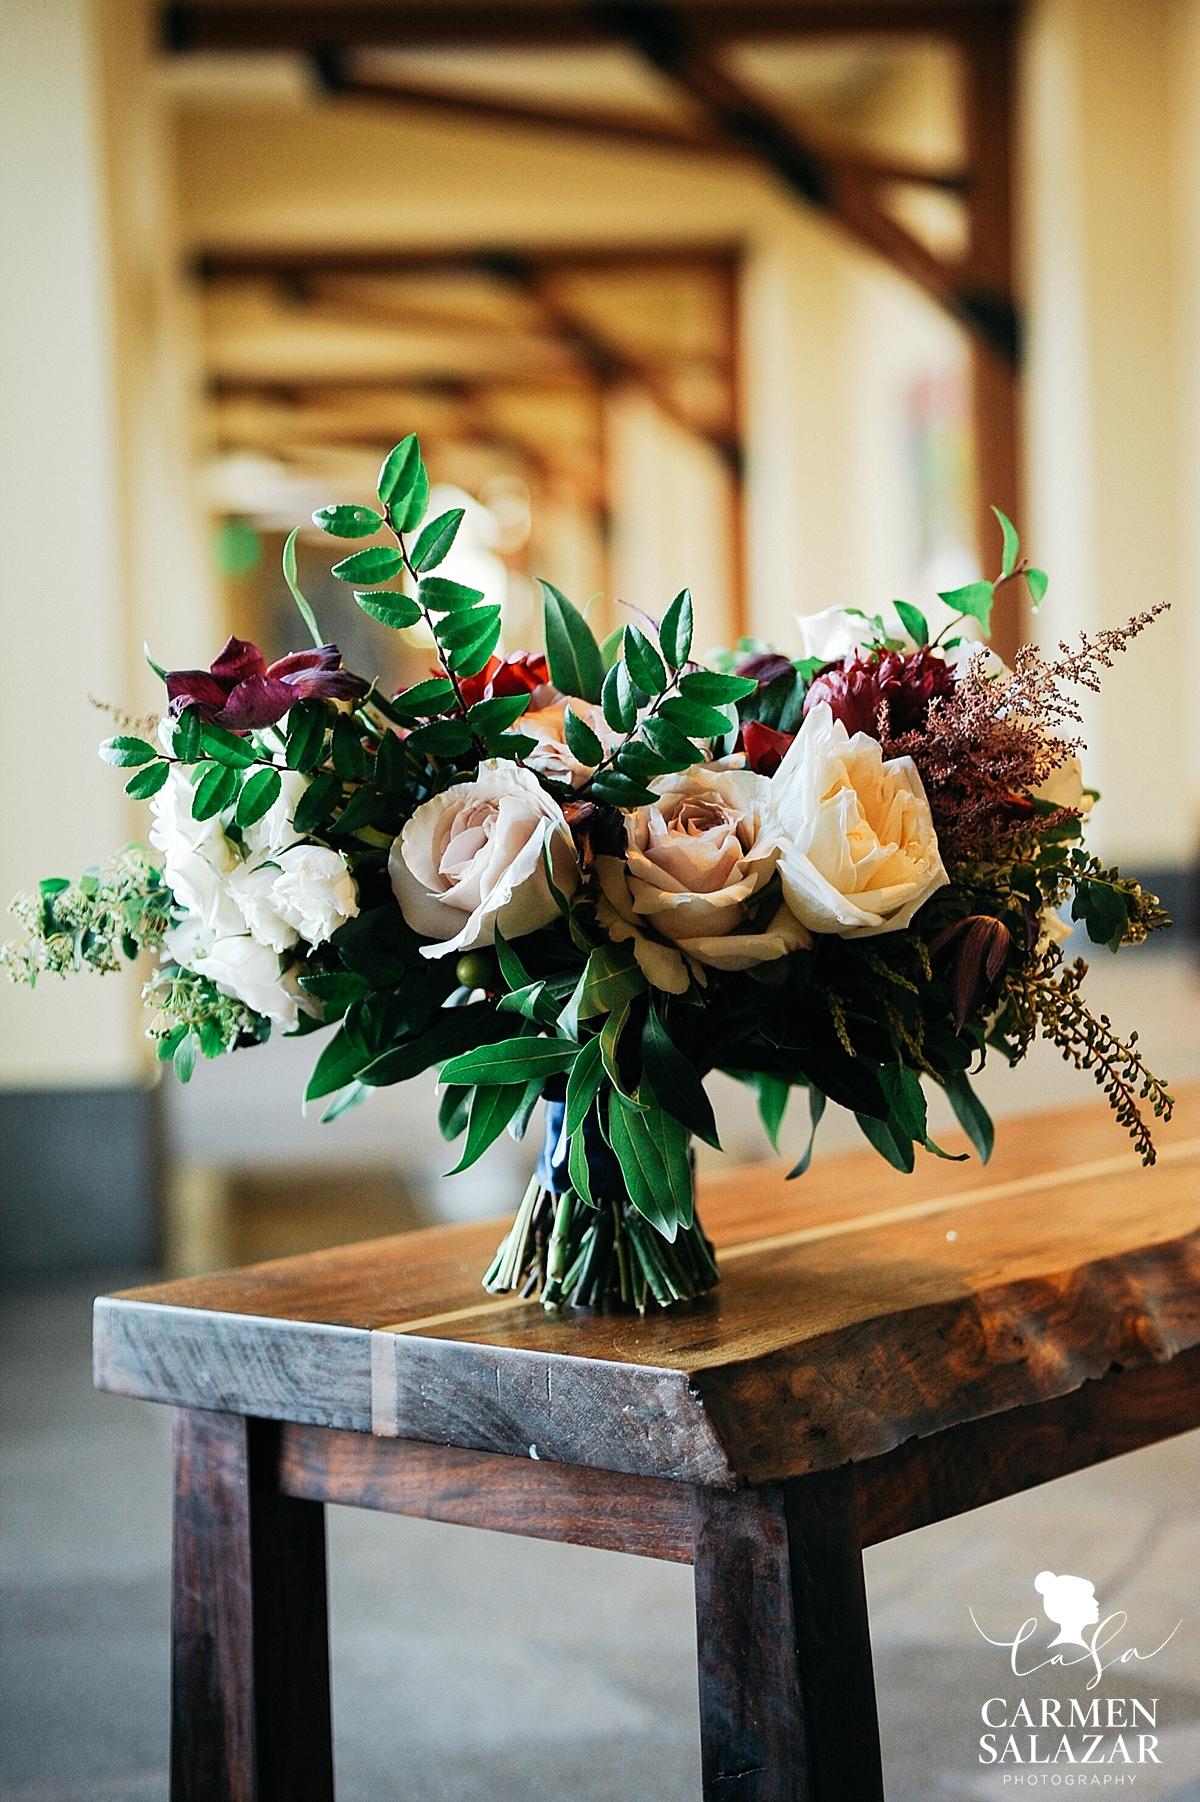 Bloomers floral artistry Sacramento - Carmen Salazar